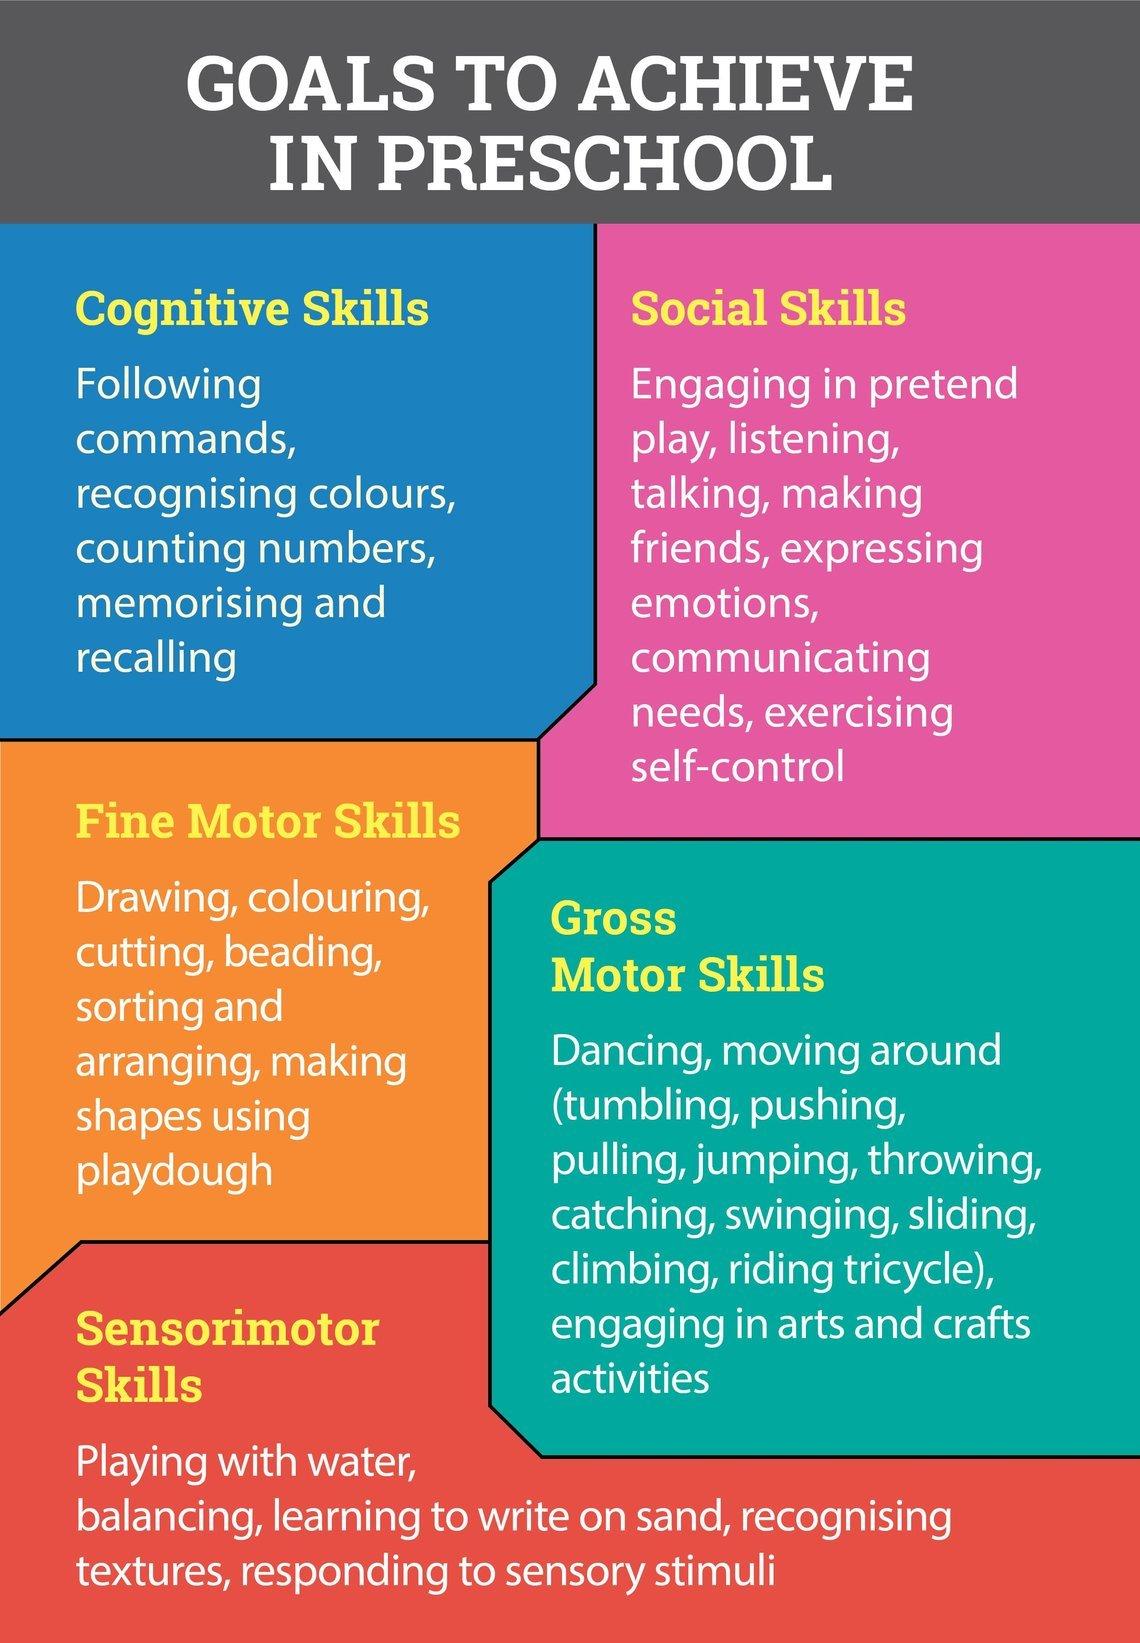 Top 20 Habits to Teach Your Preschooler (3–5 year olds)